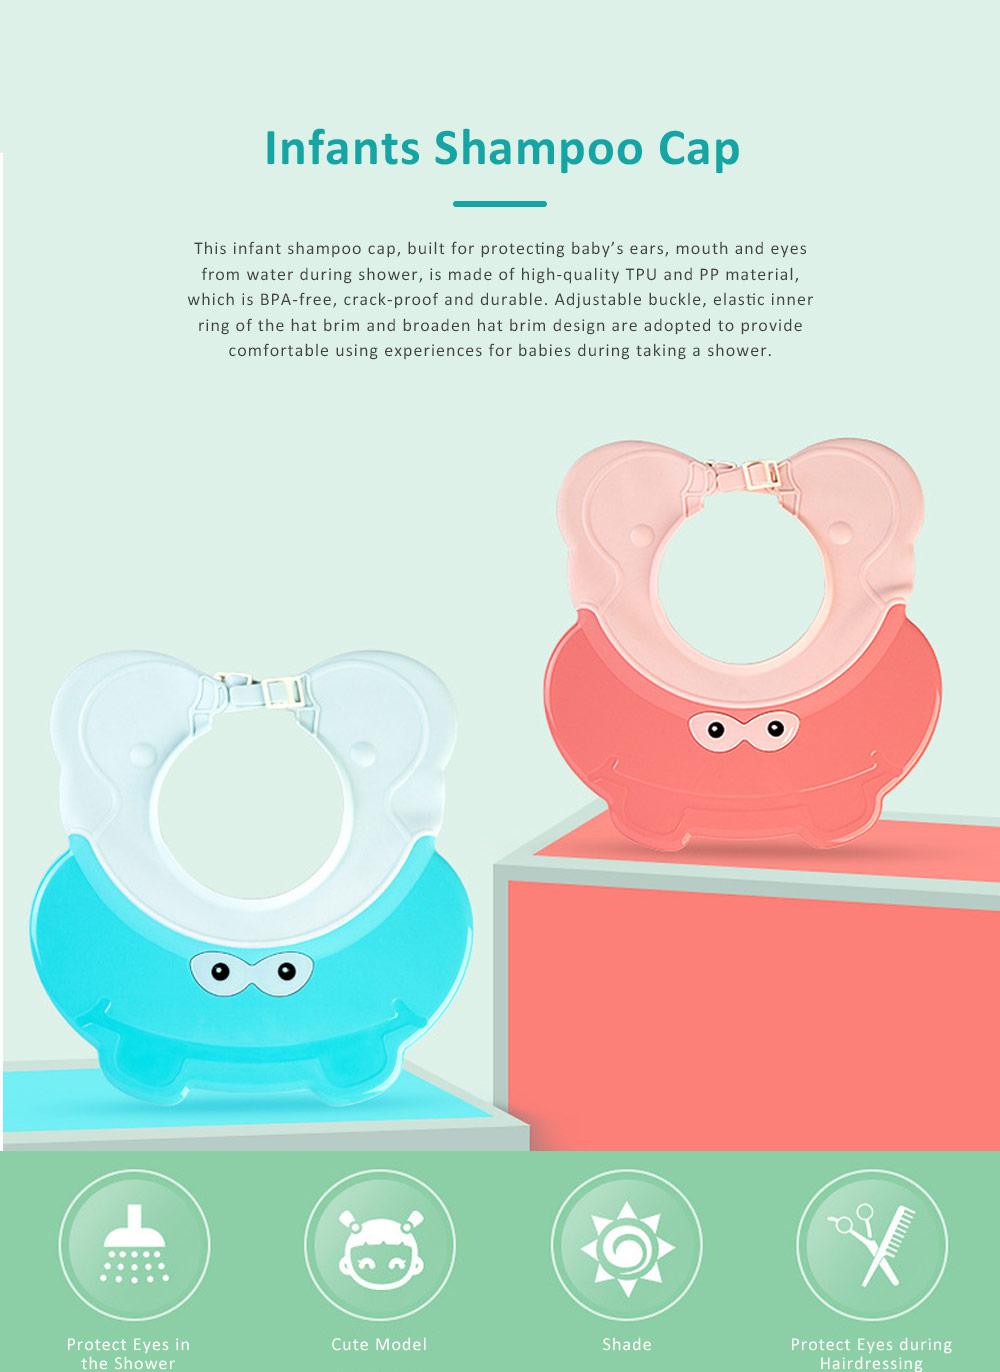 Animal Model Baby Shampoo Cap, Ultra-soft Elastic Ears Eyes Mouth Protection Shower Hat for Infants Shampoo Cap 0